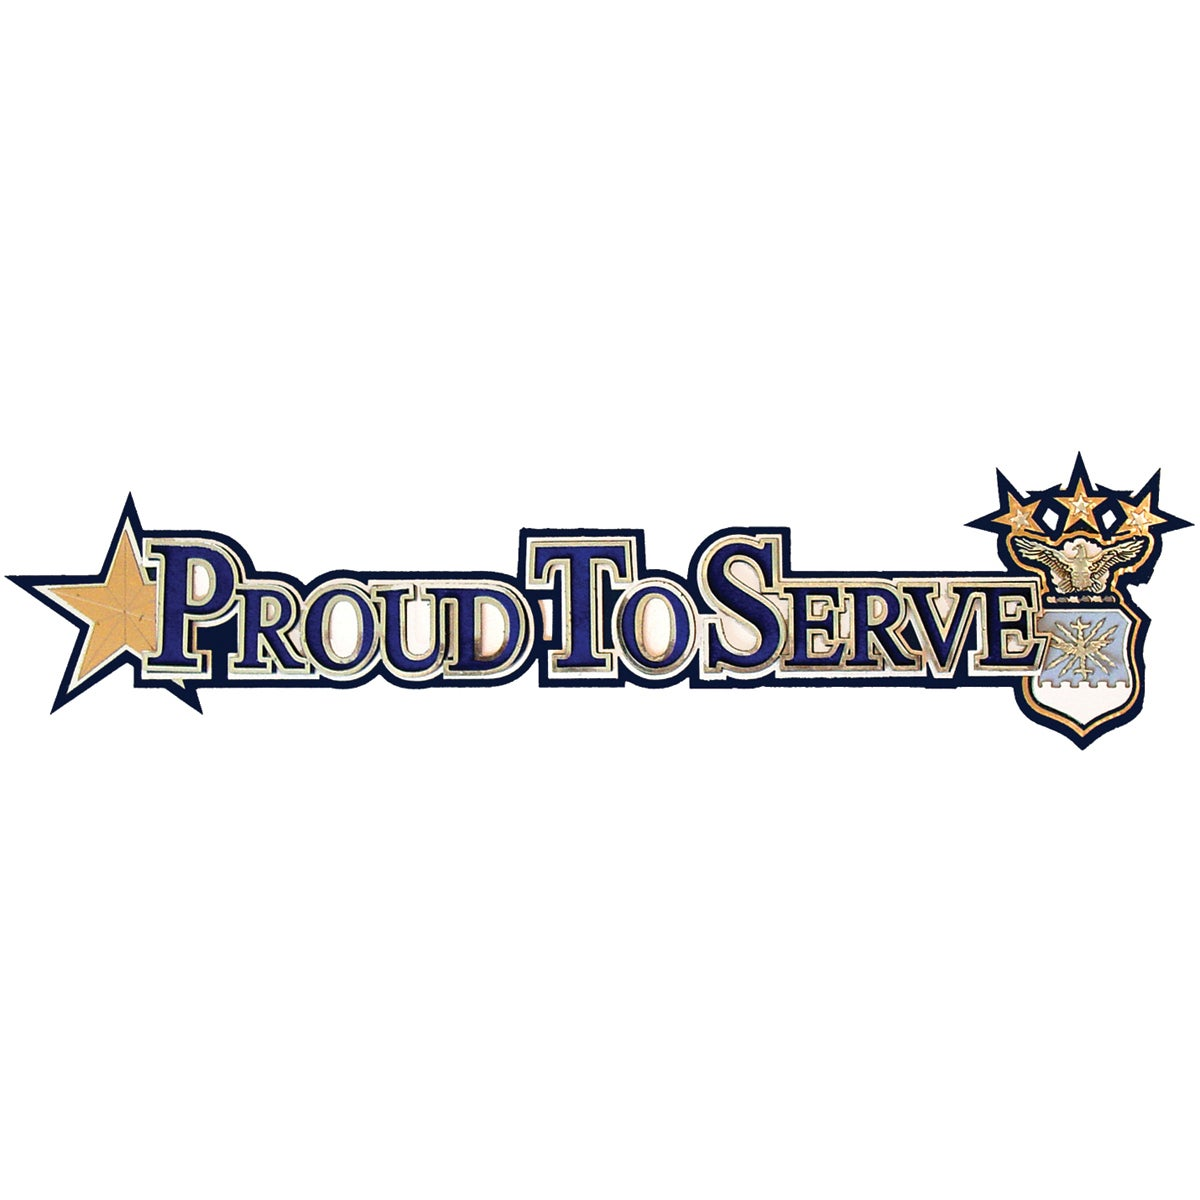 U.S. Air Force Diecut-Proud To Serve